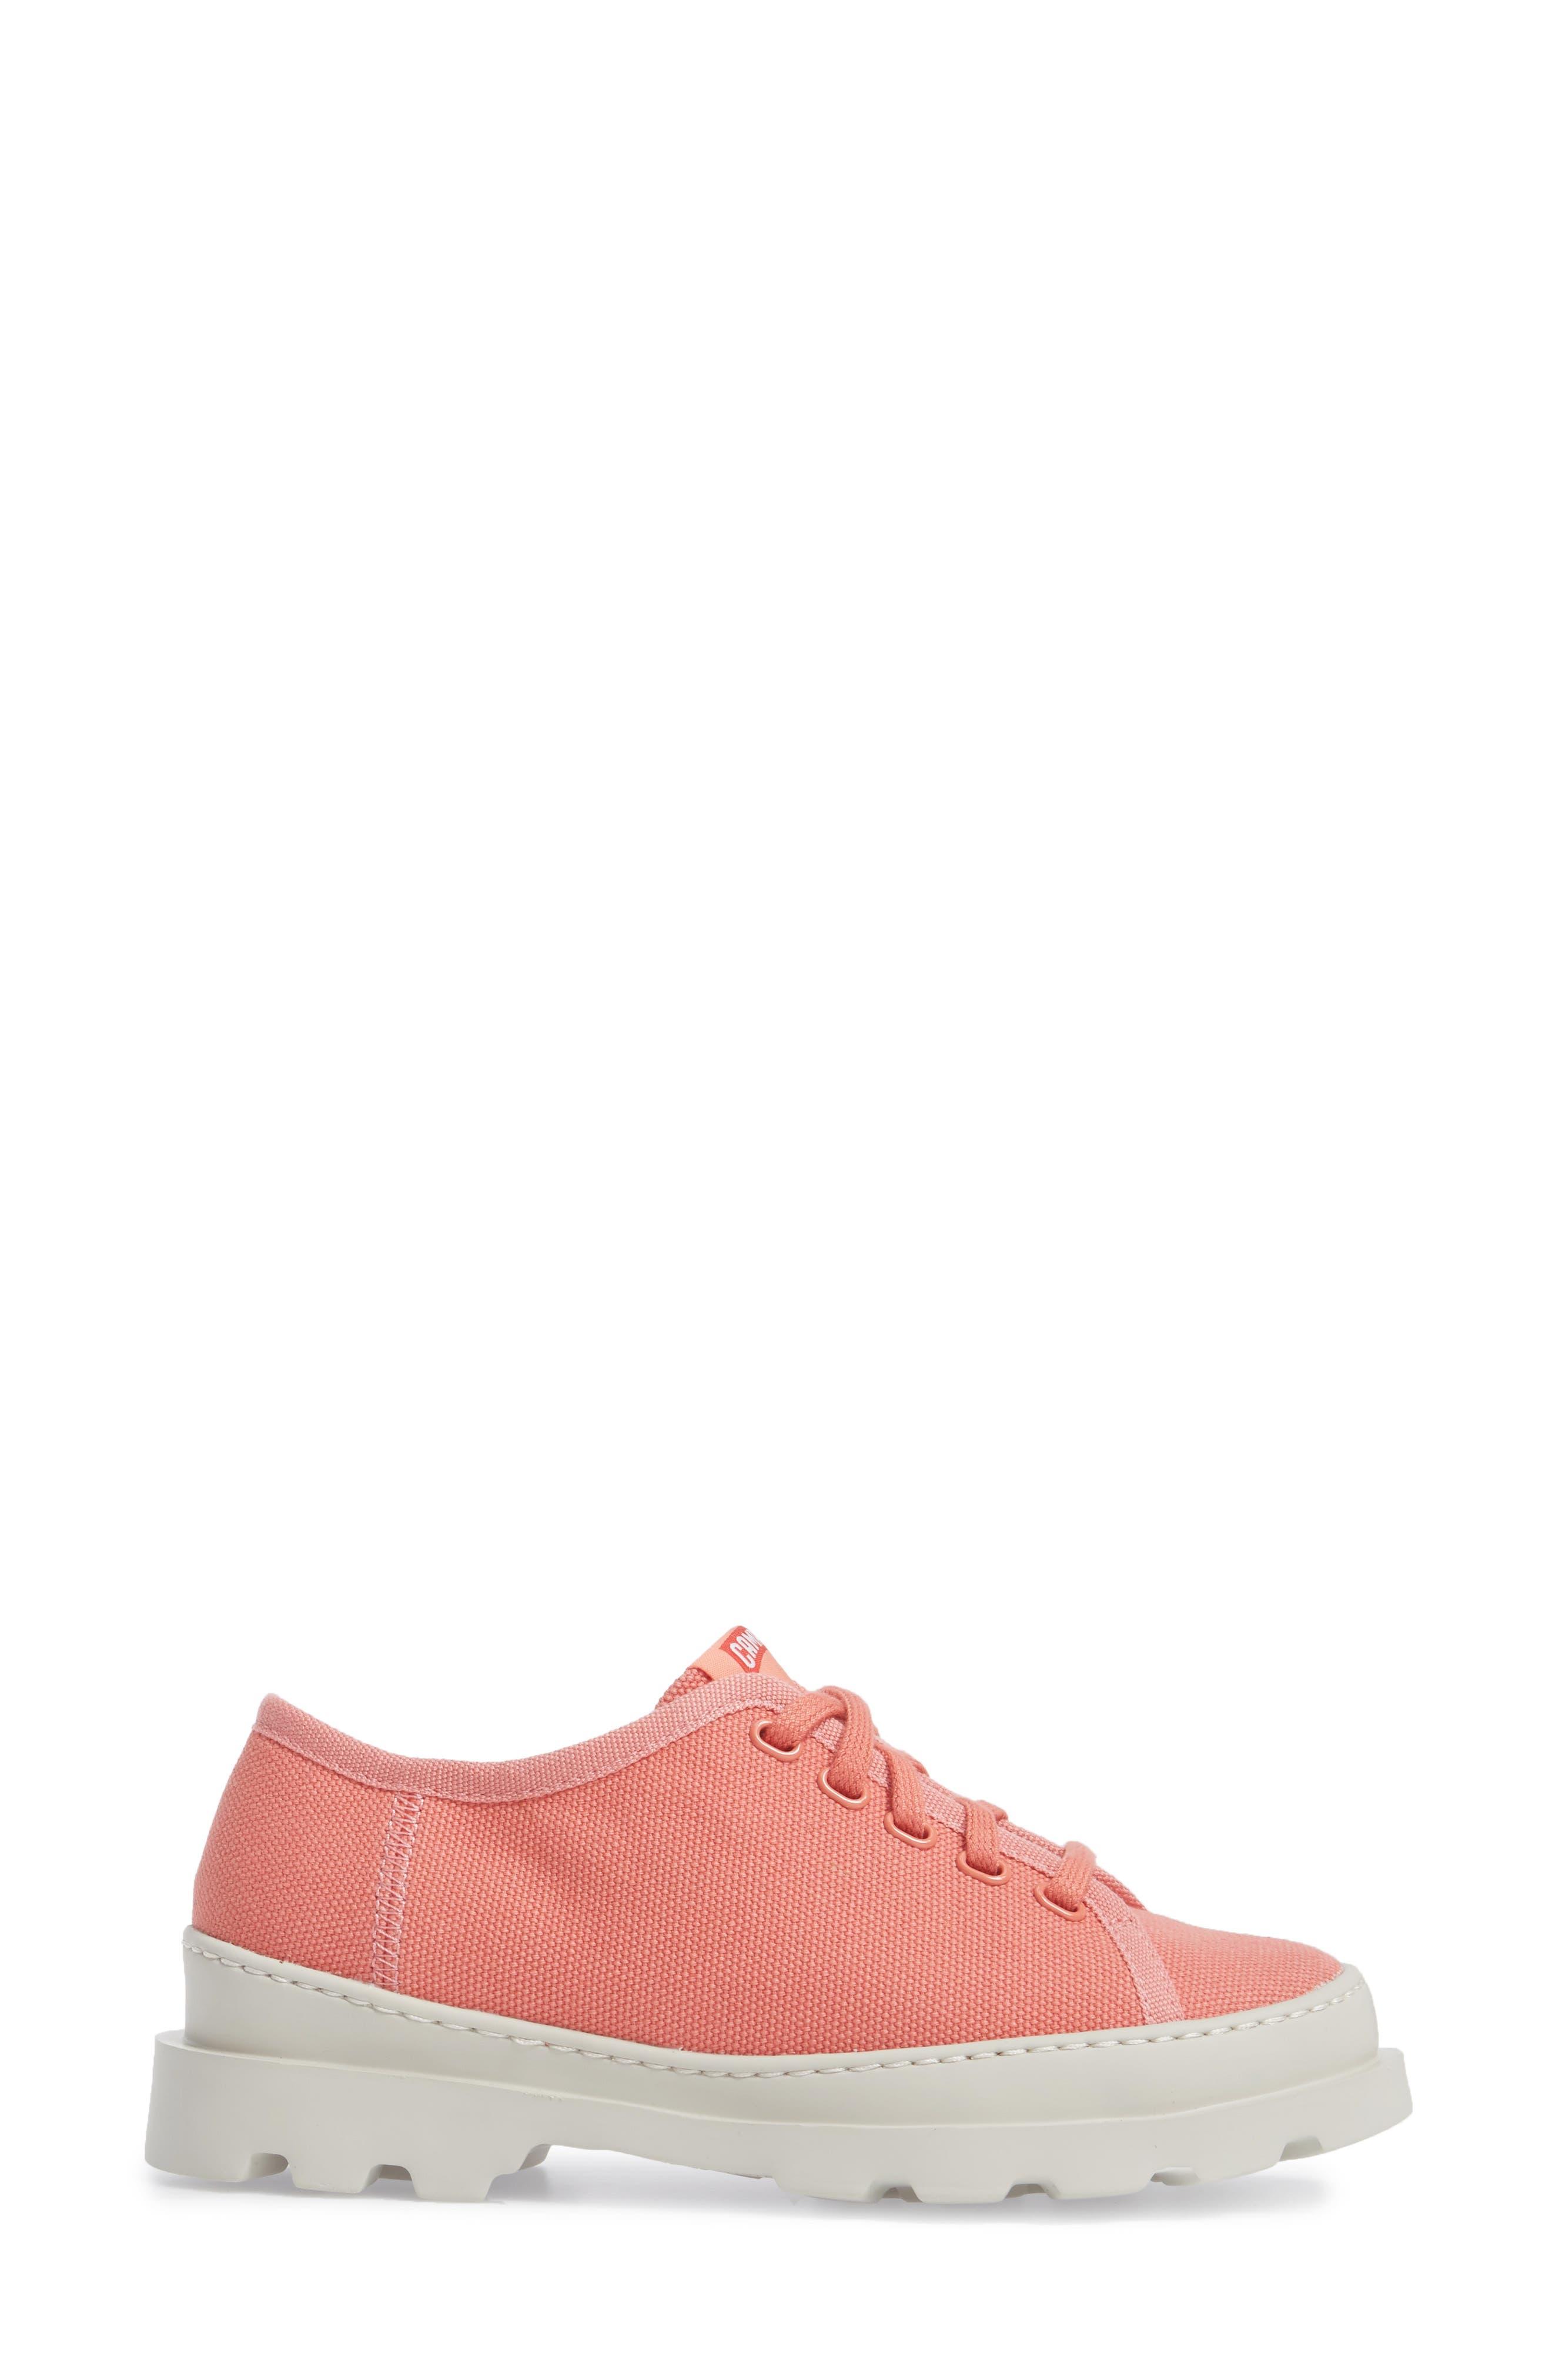 Brutus Lugged Platform Sneaker,                             Alternate thumbnail 3, color,                             PINK